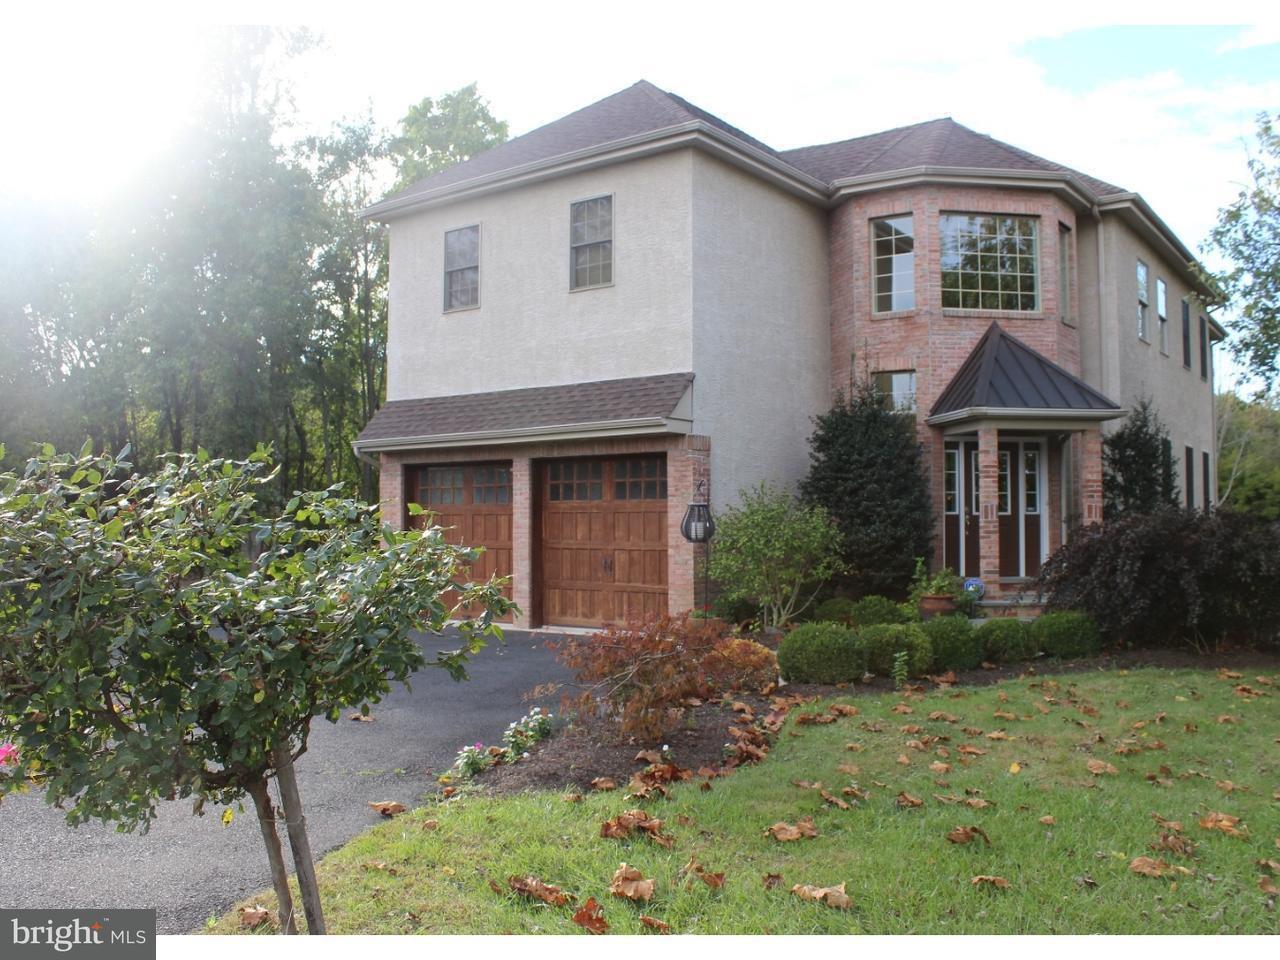 独户住宅 为 销售 在 422 LOWER STATE Road North Wales, 宾夕法尼亚州 19454 美国